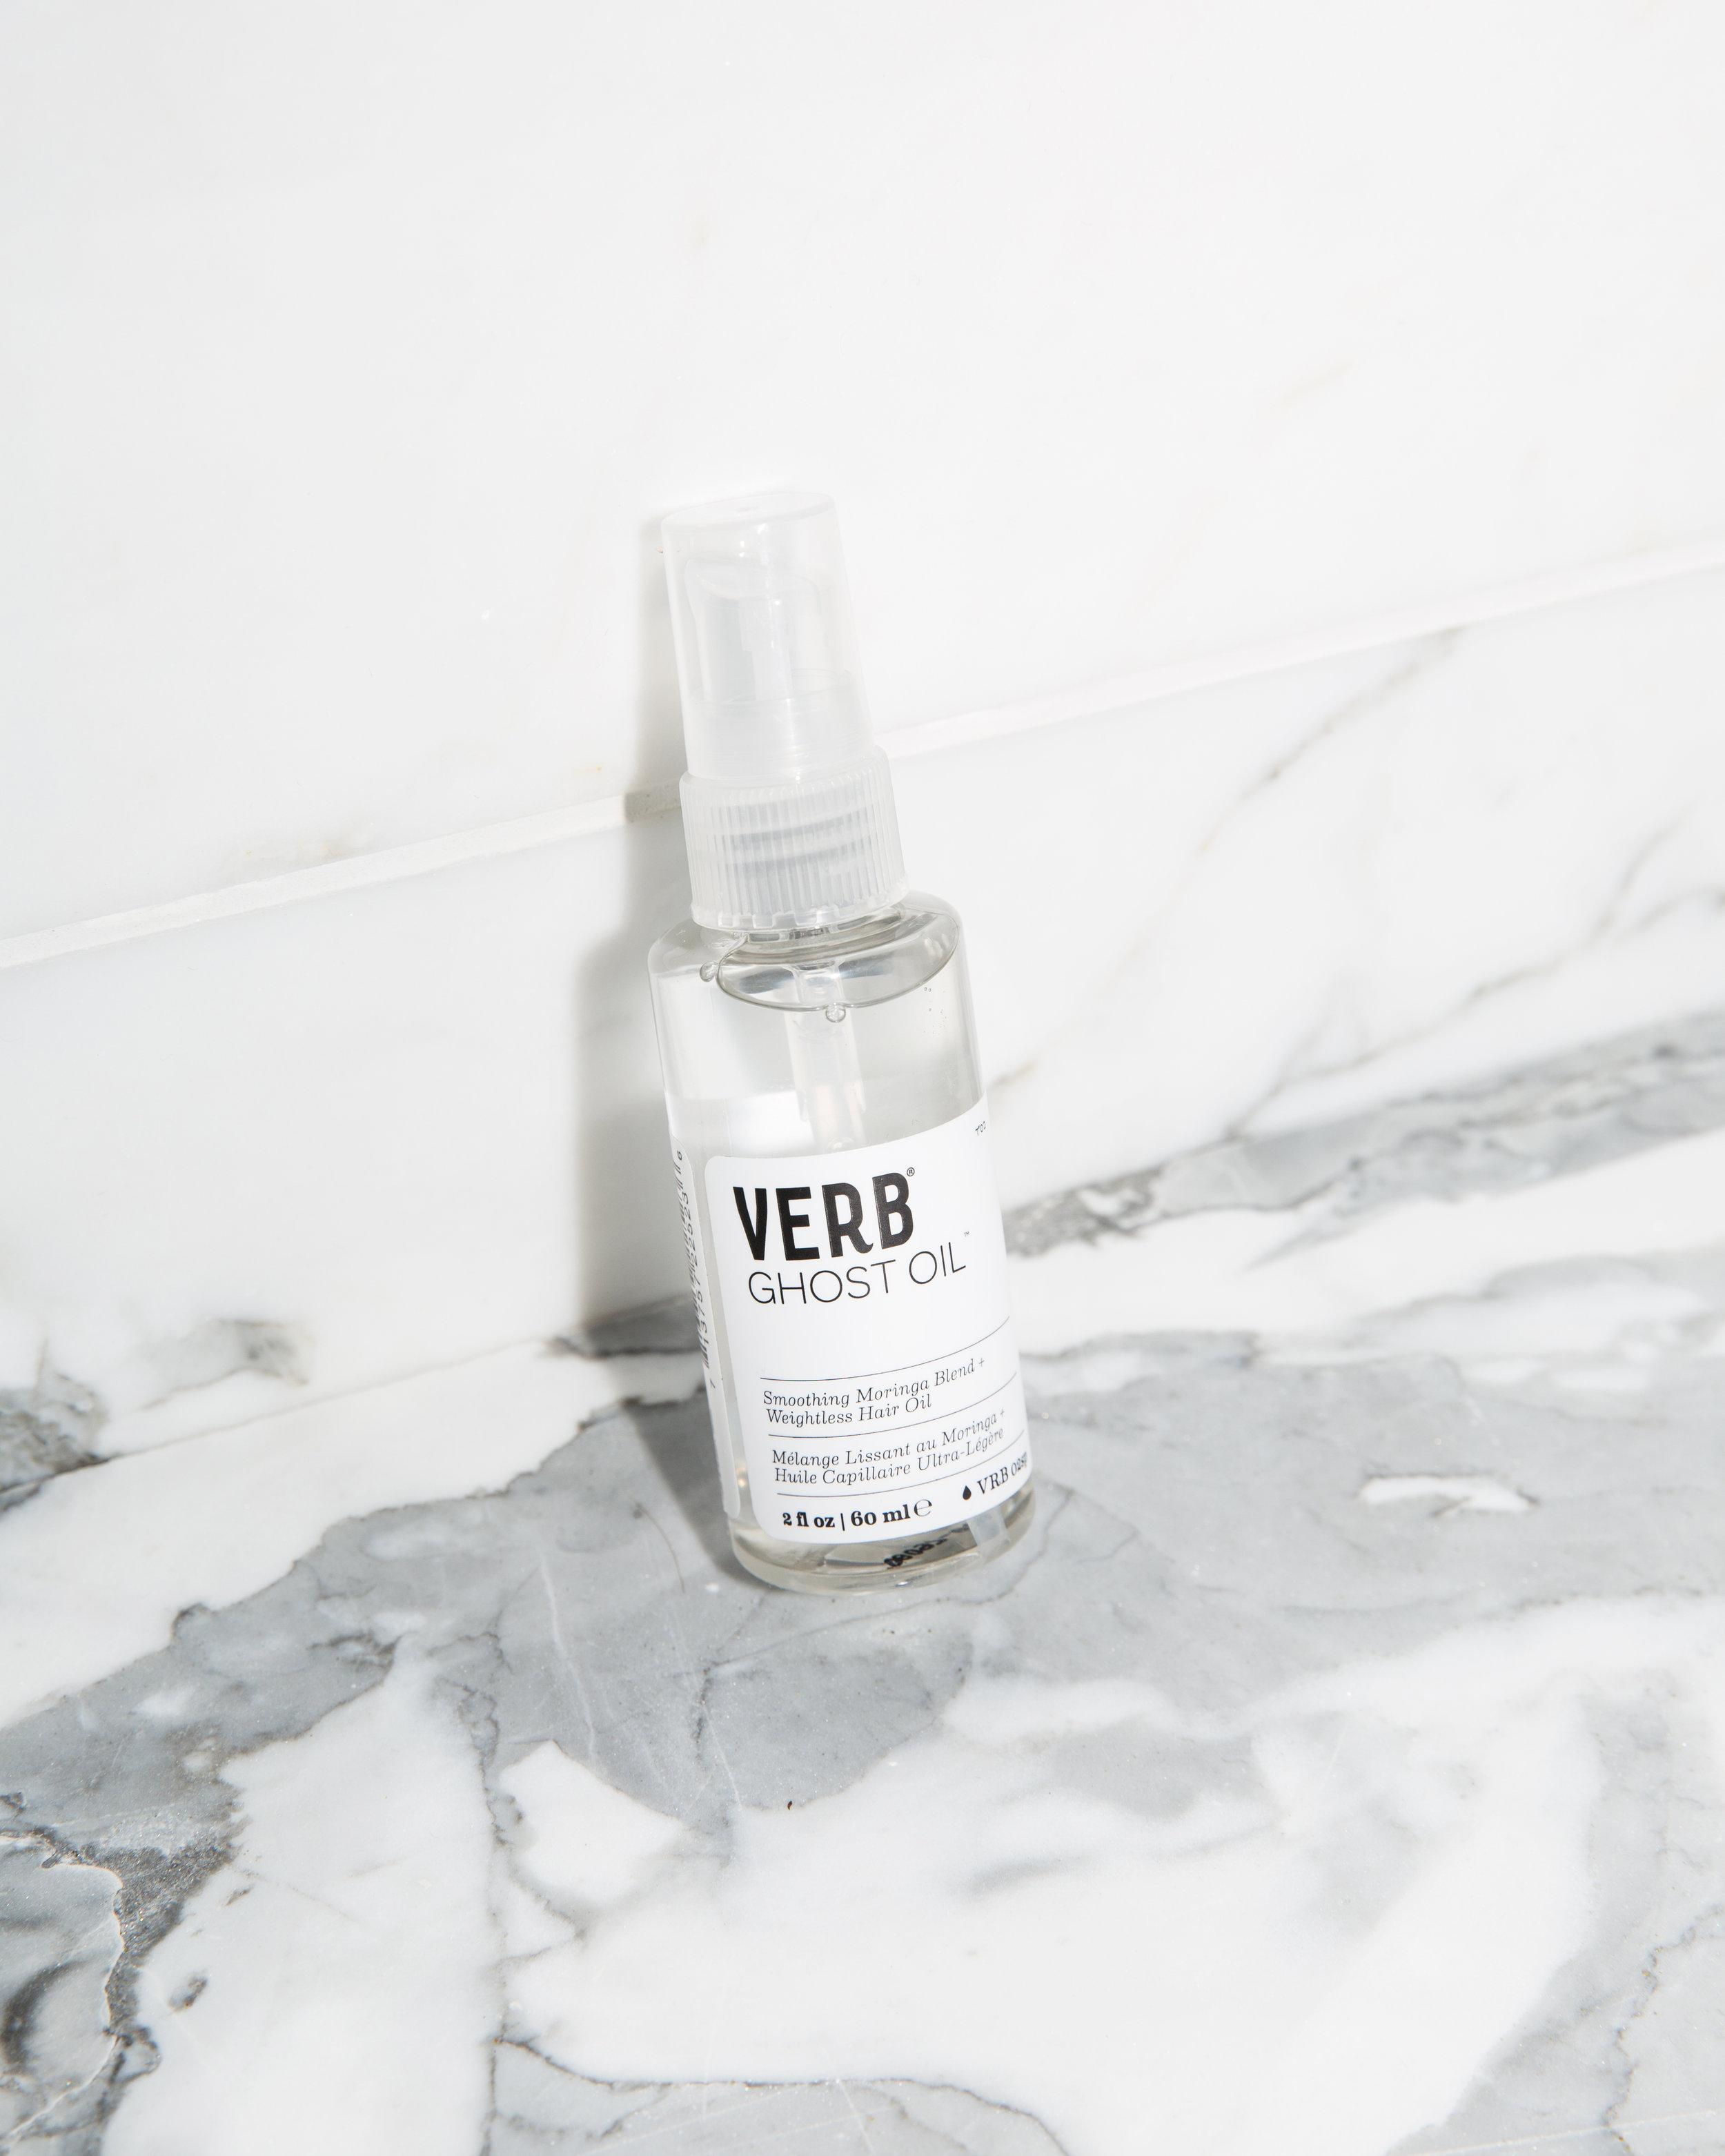 VERB-7812(crop).jpg